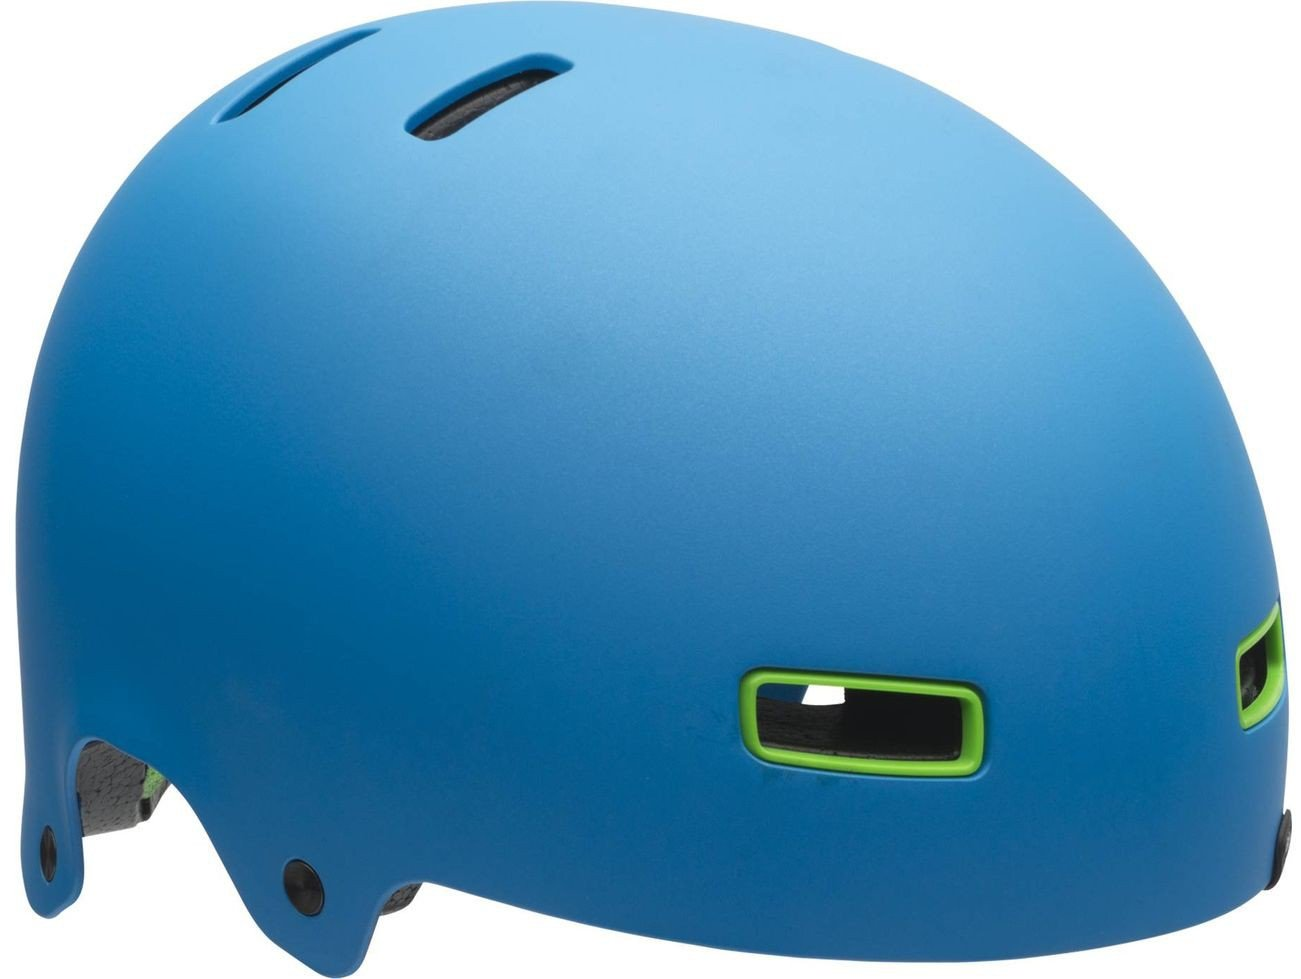 Bell Erwachsene Helm REFLEX 16